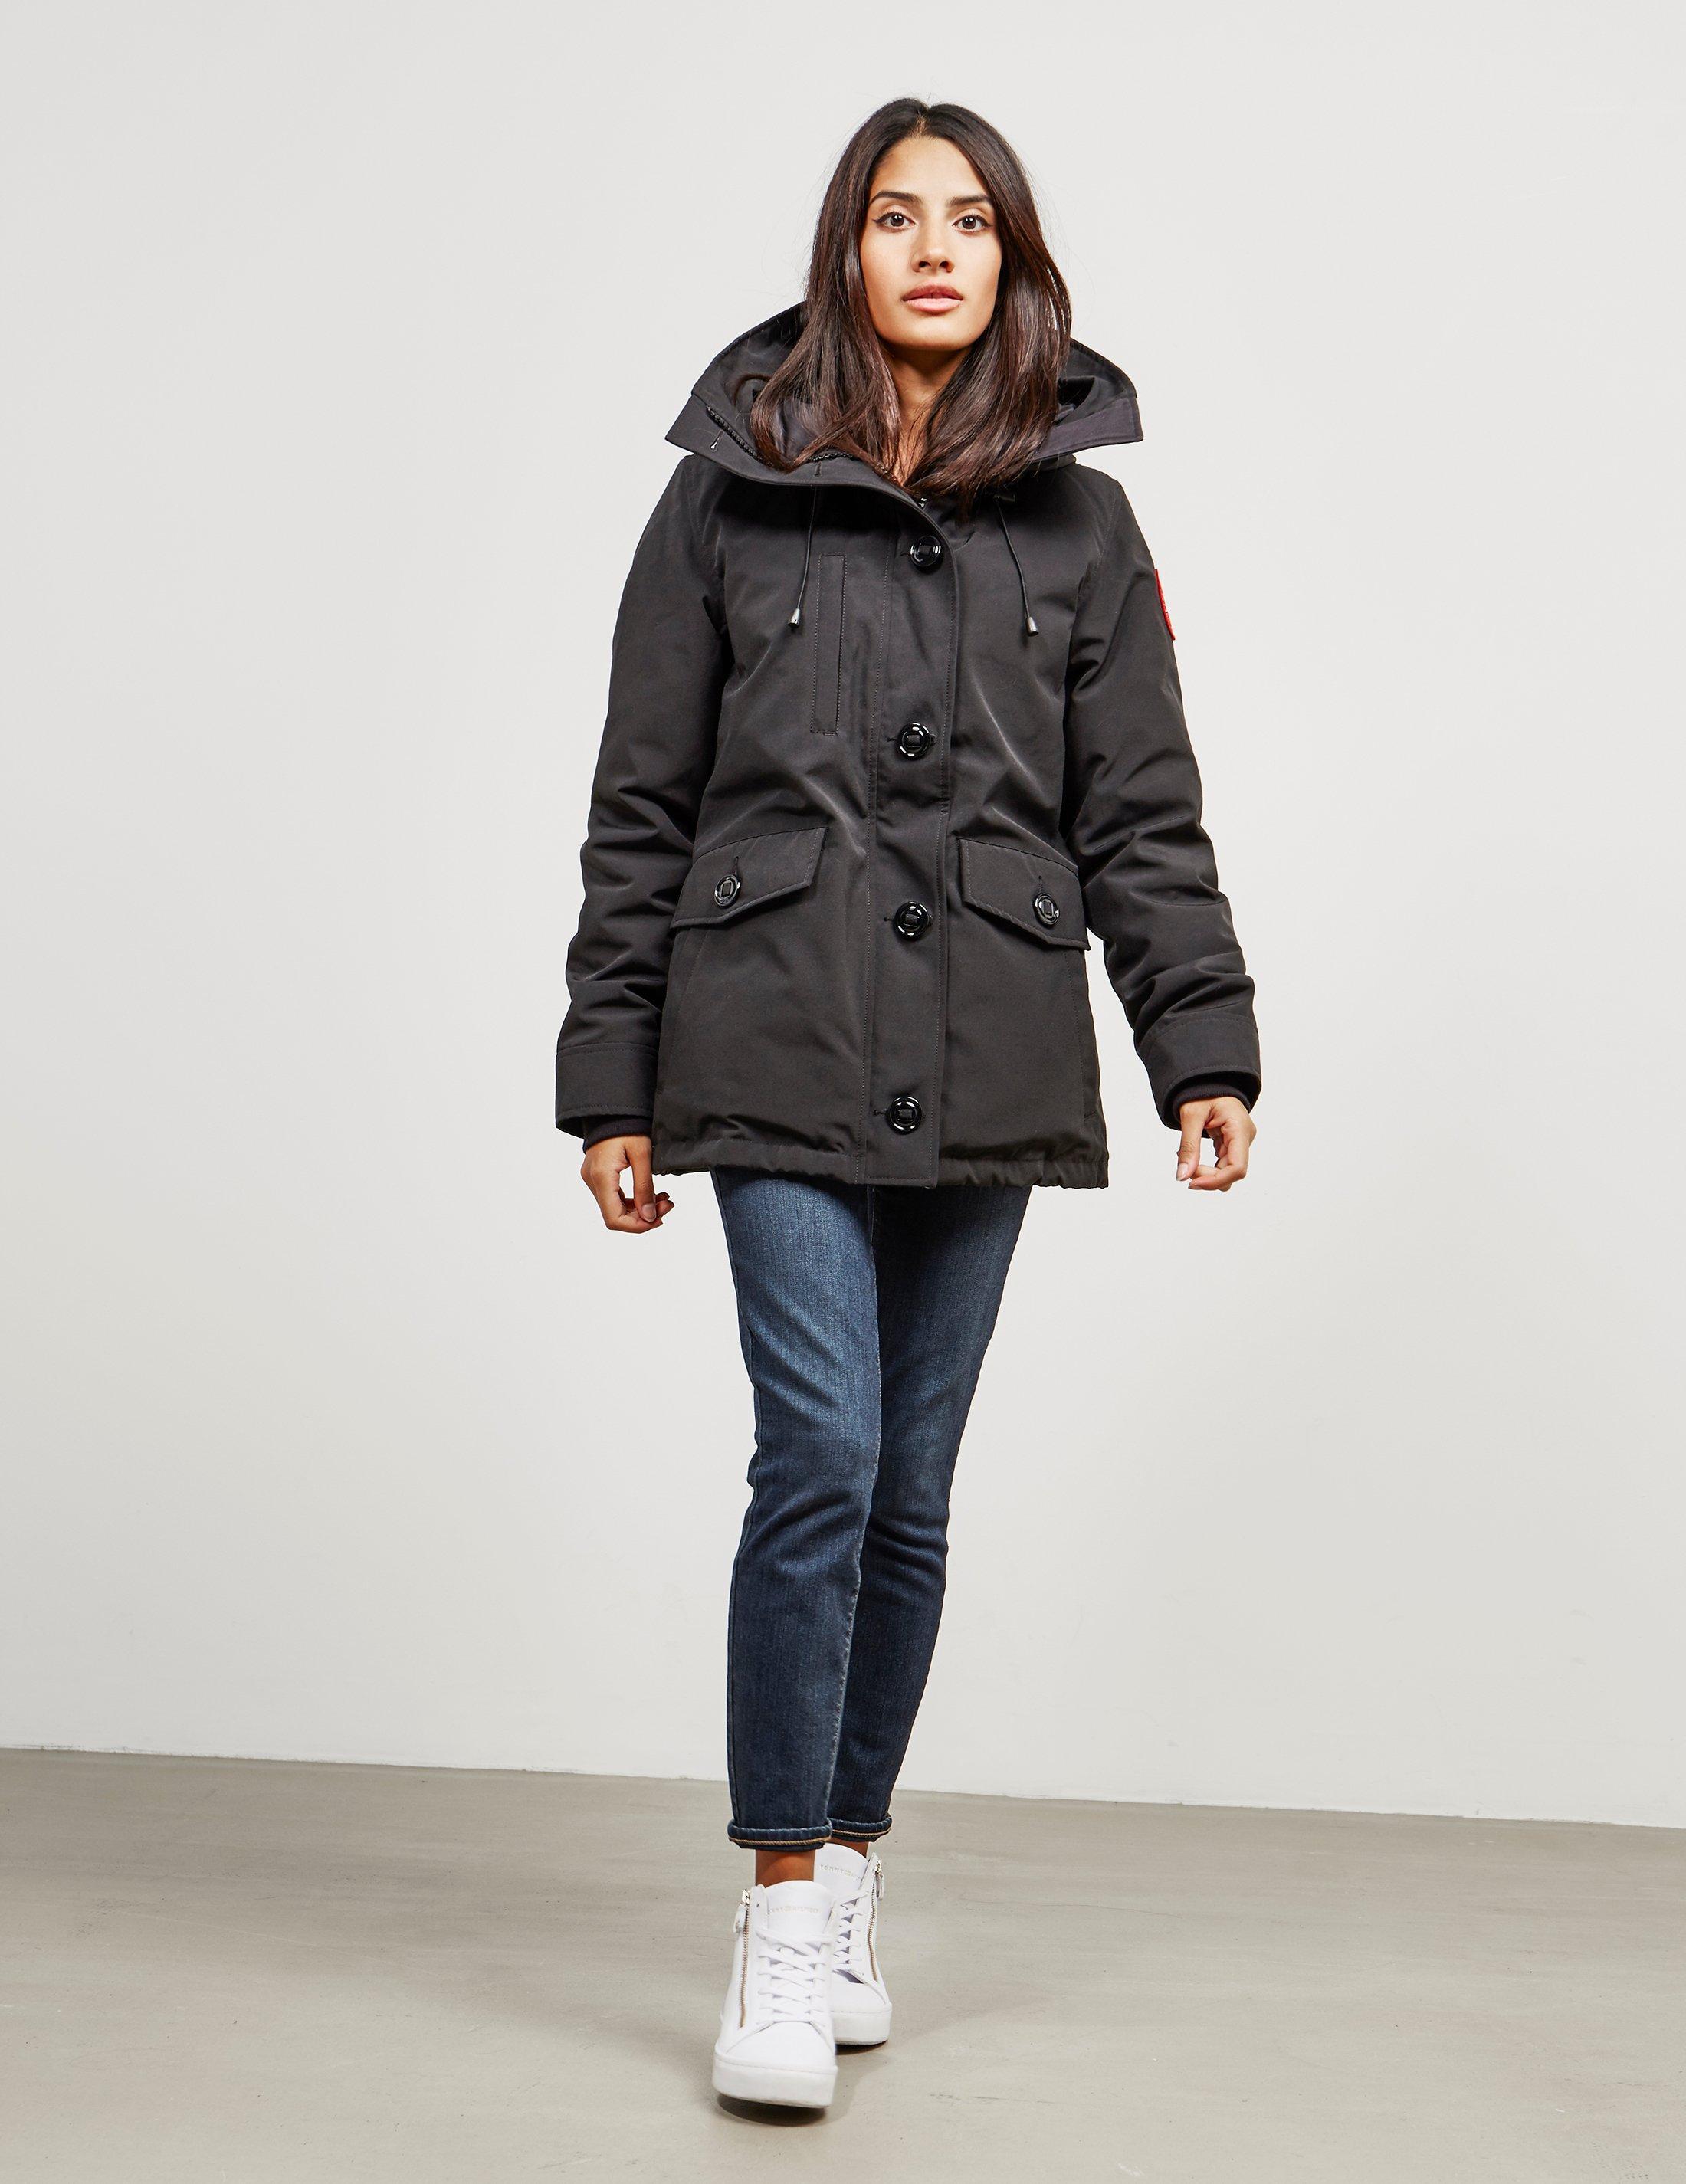 cd3c14936fd1 ... ireland lyst canada goose womens rideau padded parka jacket black in  black save 1.2790697674418539 738c6 2ee4b